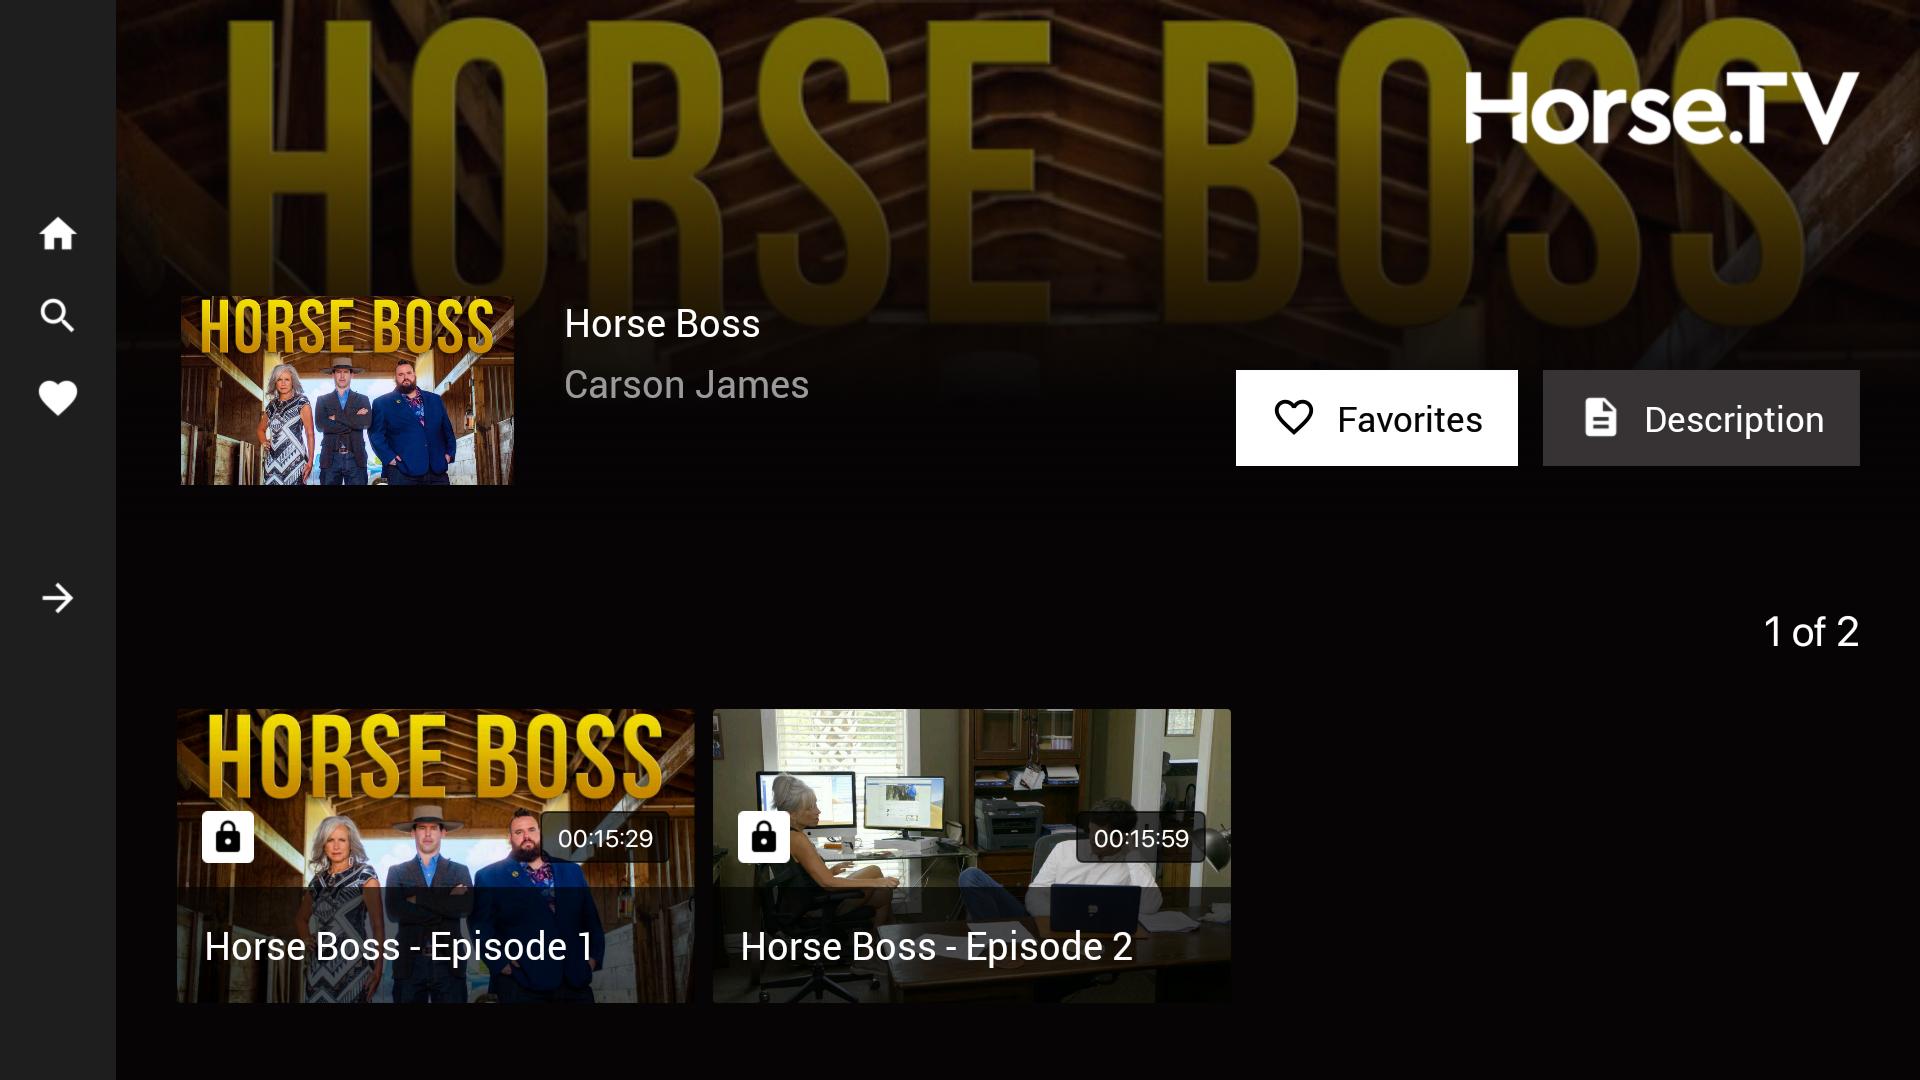 Horse.TV: Amazon.es: Appstore para Android